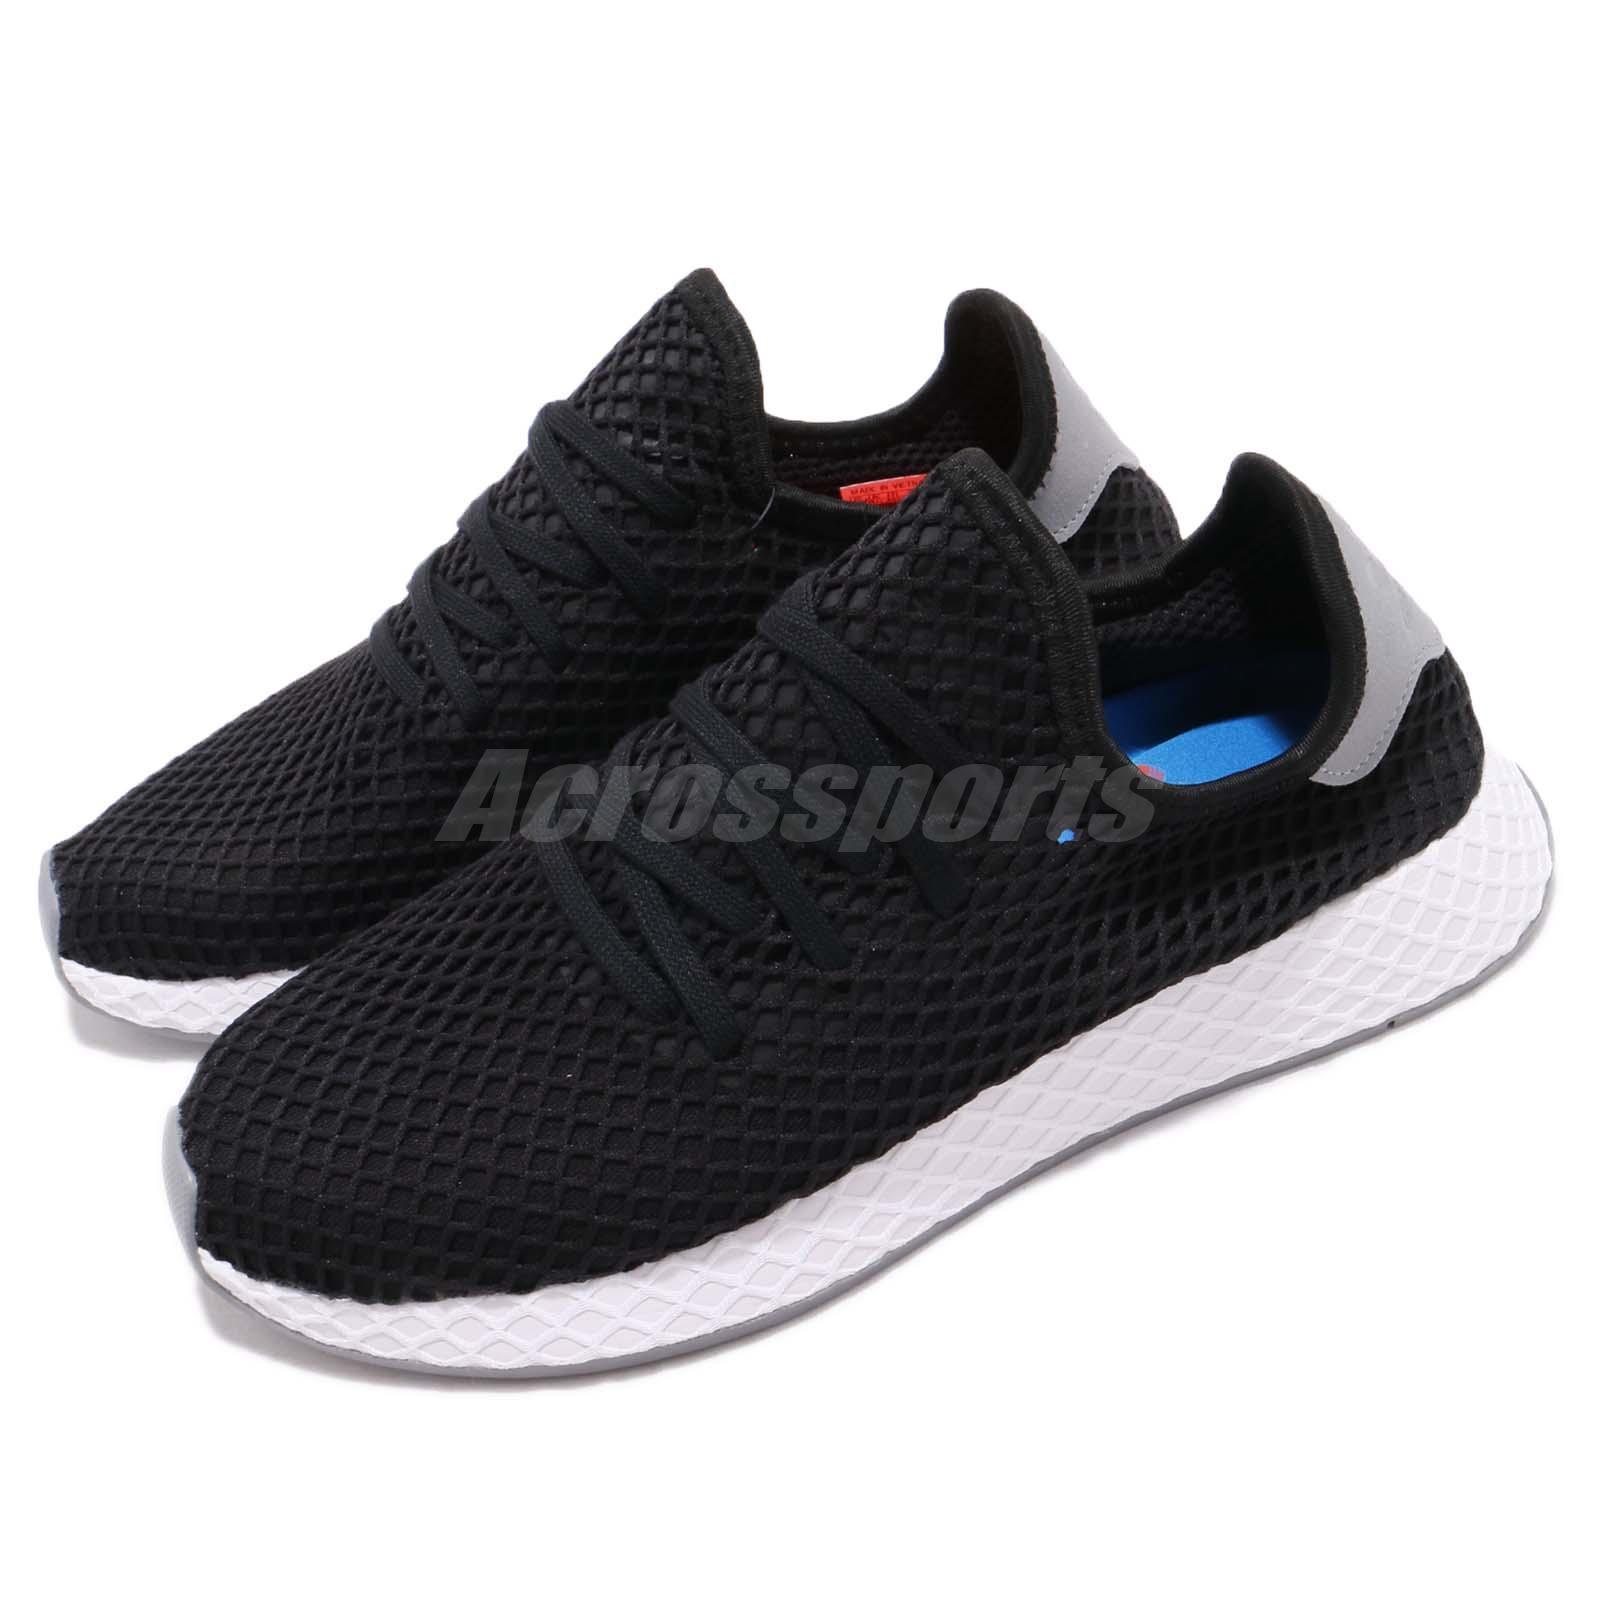 White Men Running Shoes Sneakers B41765